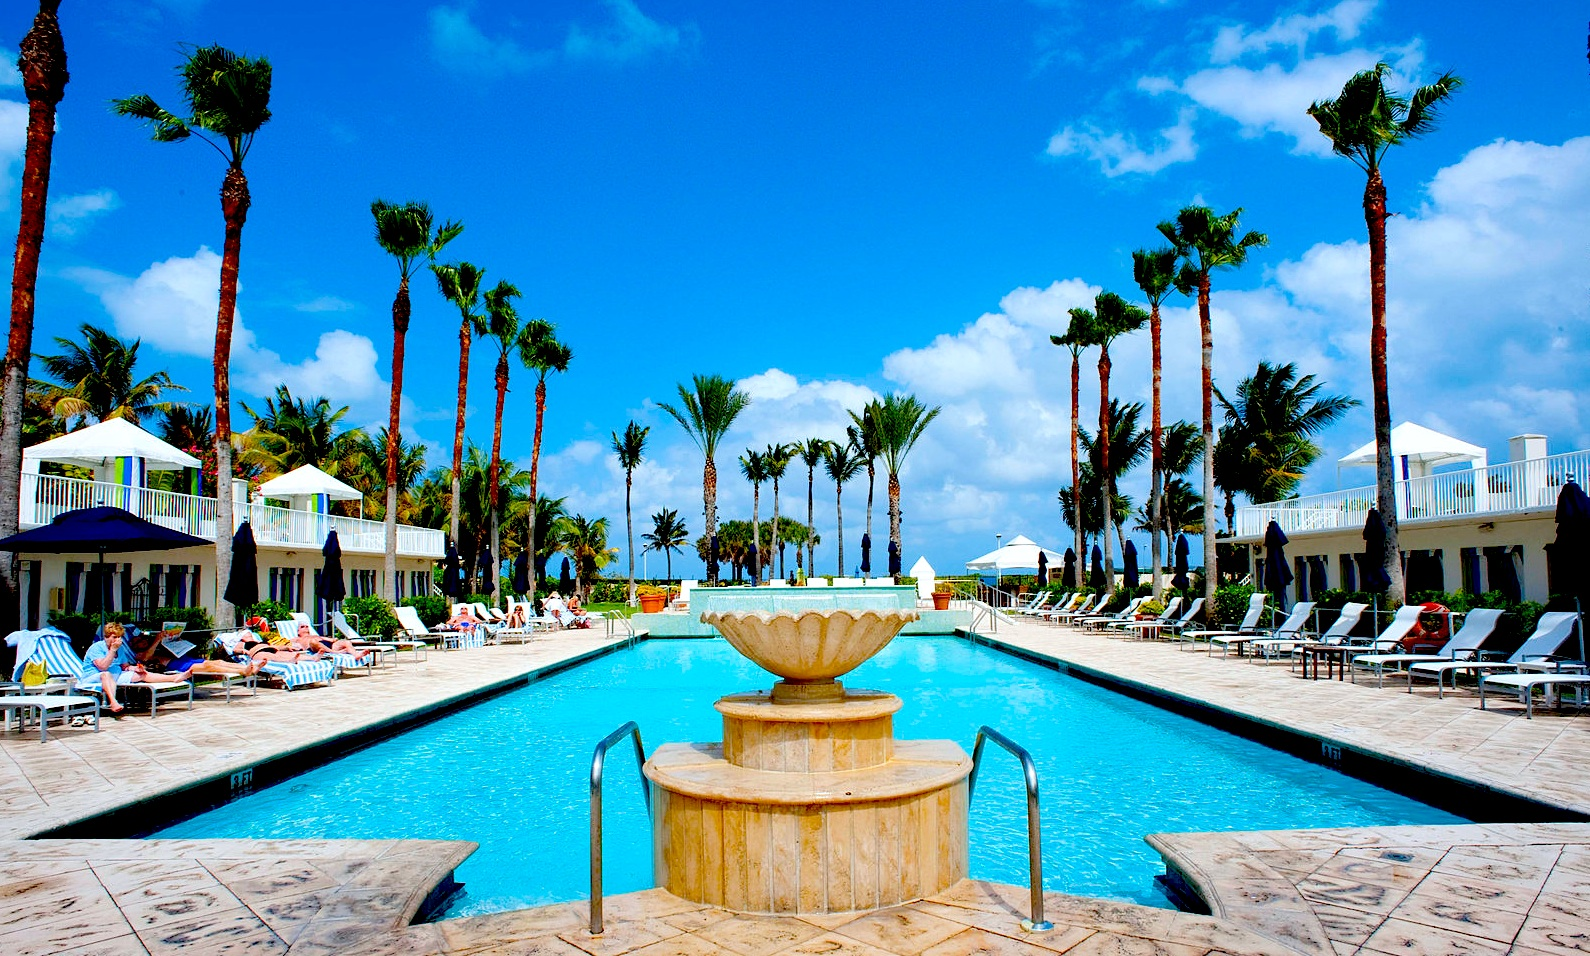 Surfcomber Miami South Beach